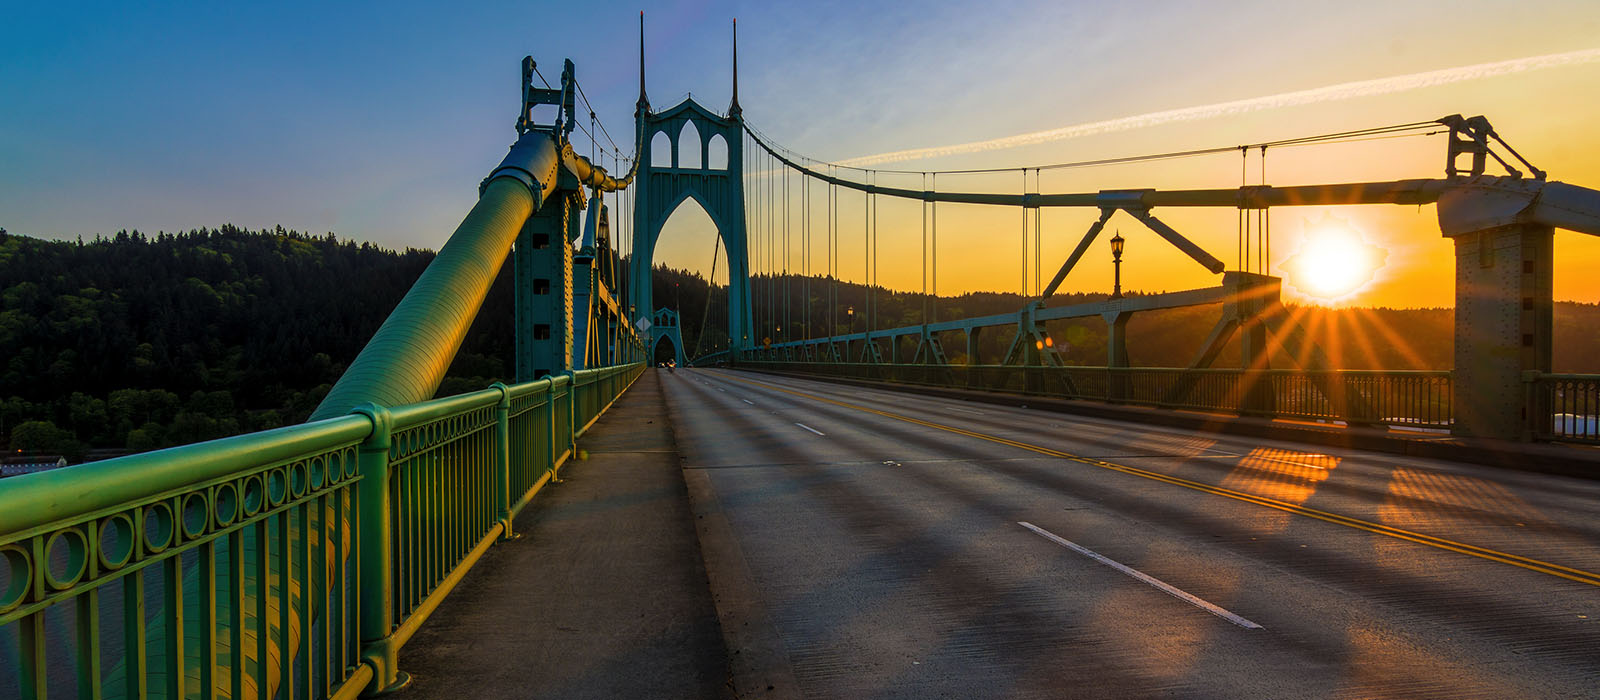 portland-relocation_0009_bigstock-St-John-s-Bridge-In-Portland-88738649